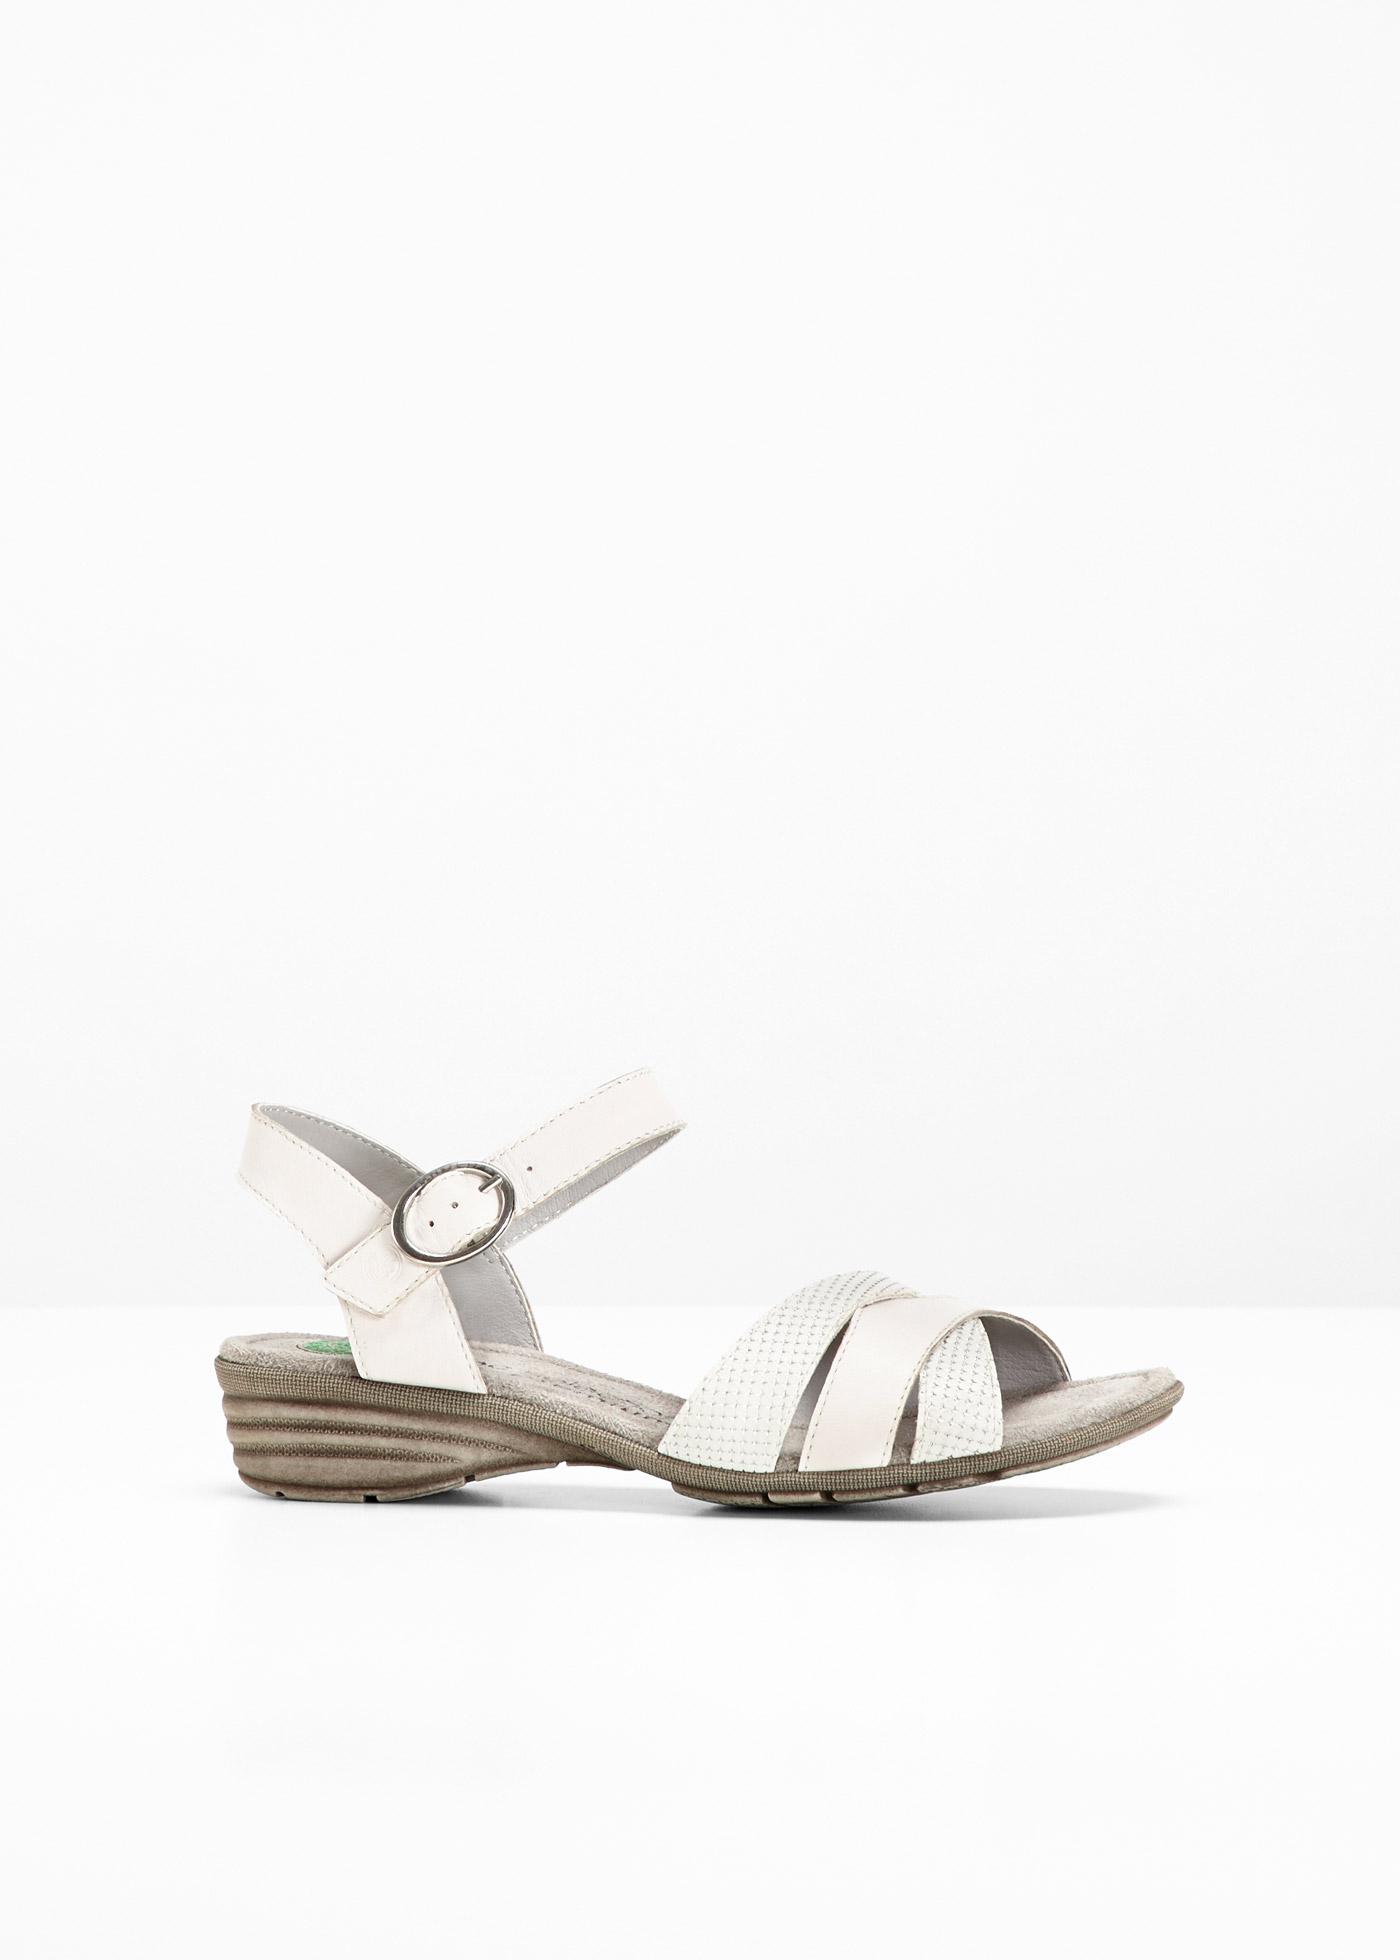 Sandales en cuir confortables